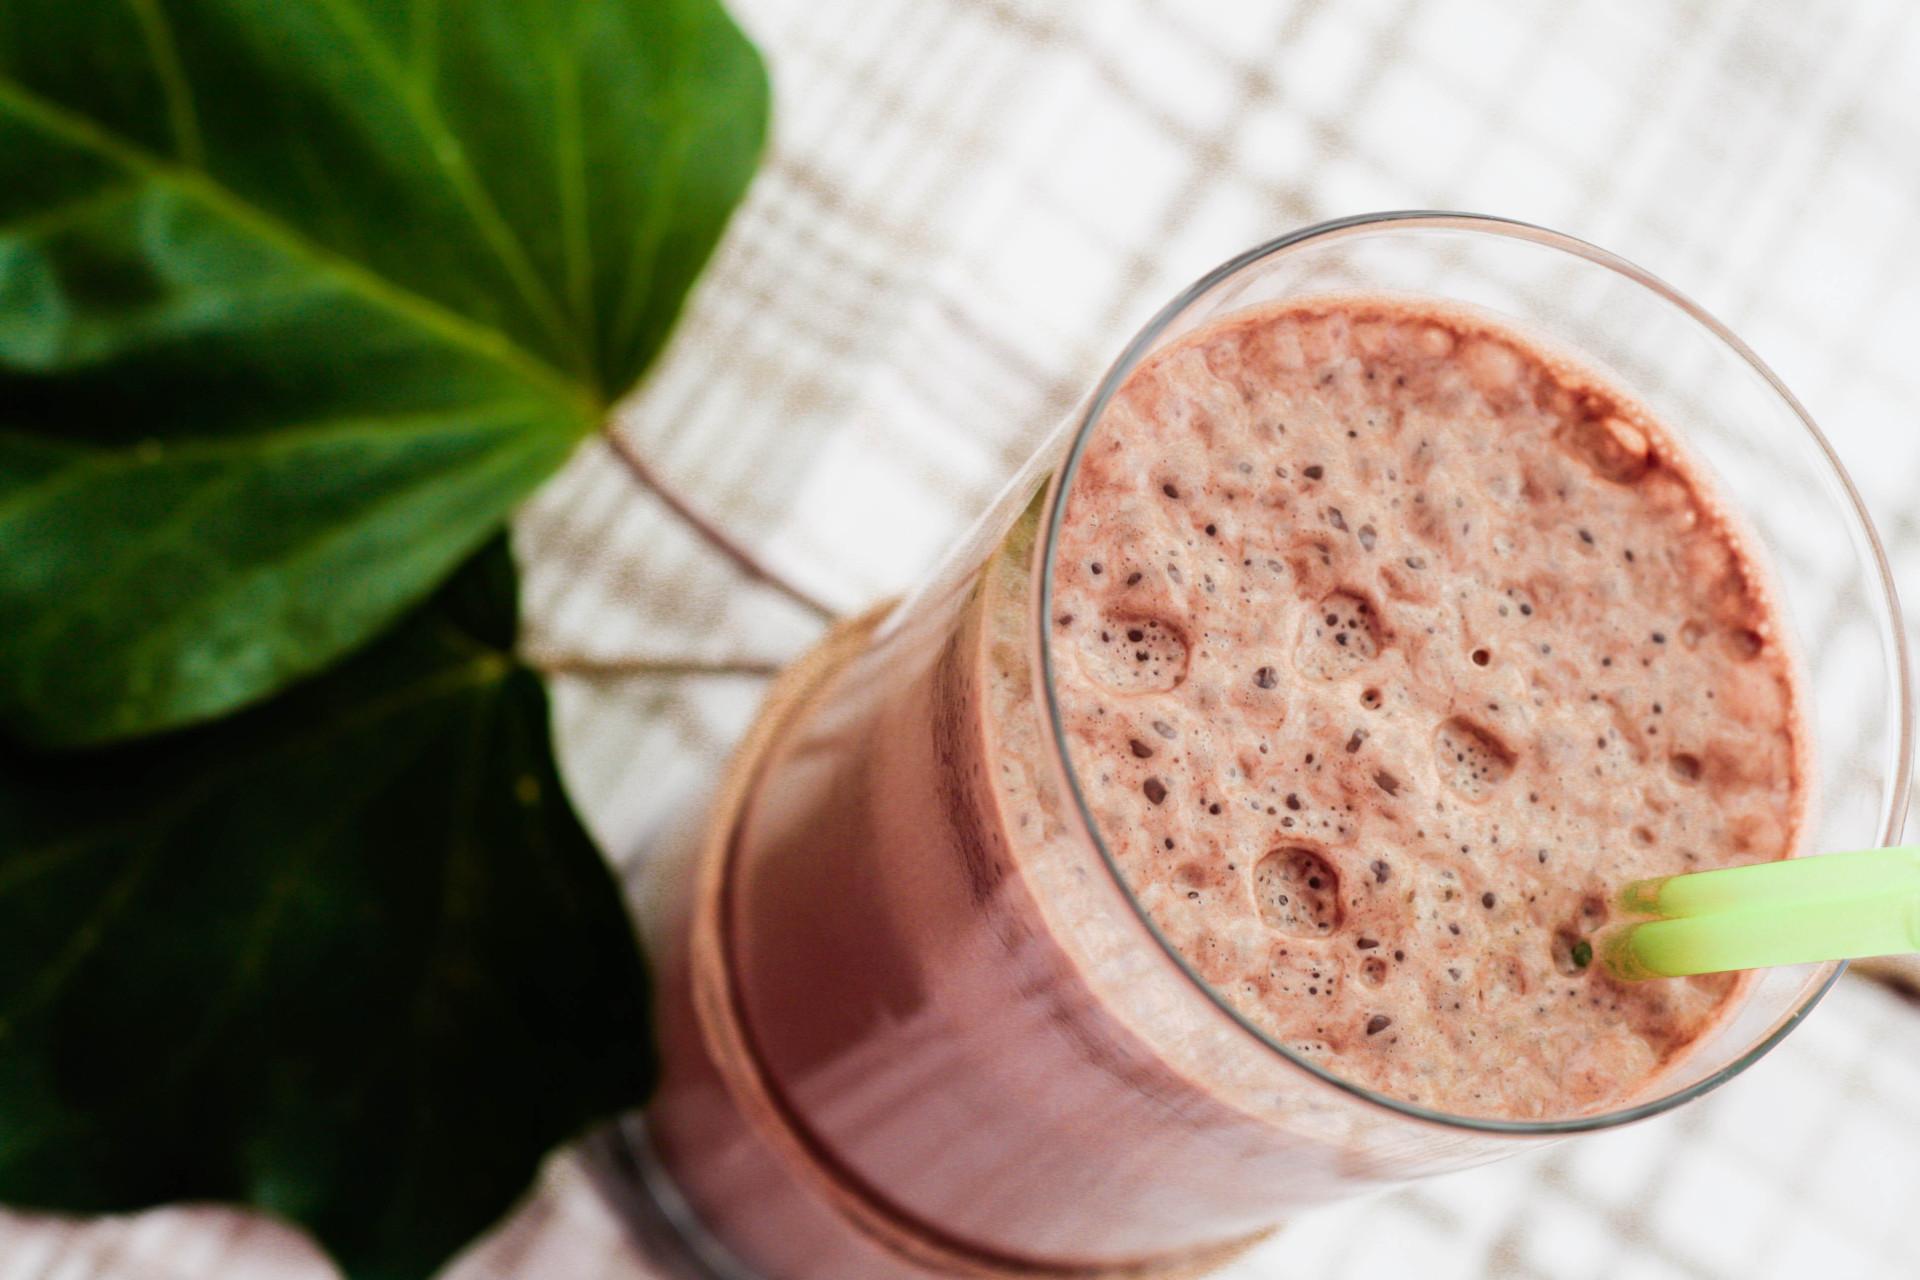 Pós-exercício: o seu corpo irá agradecer estes snacks